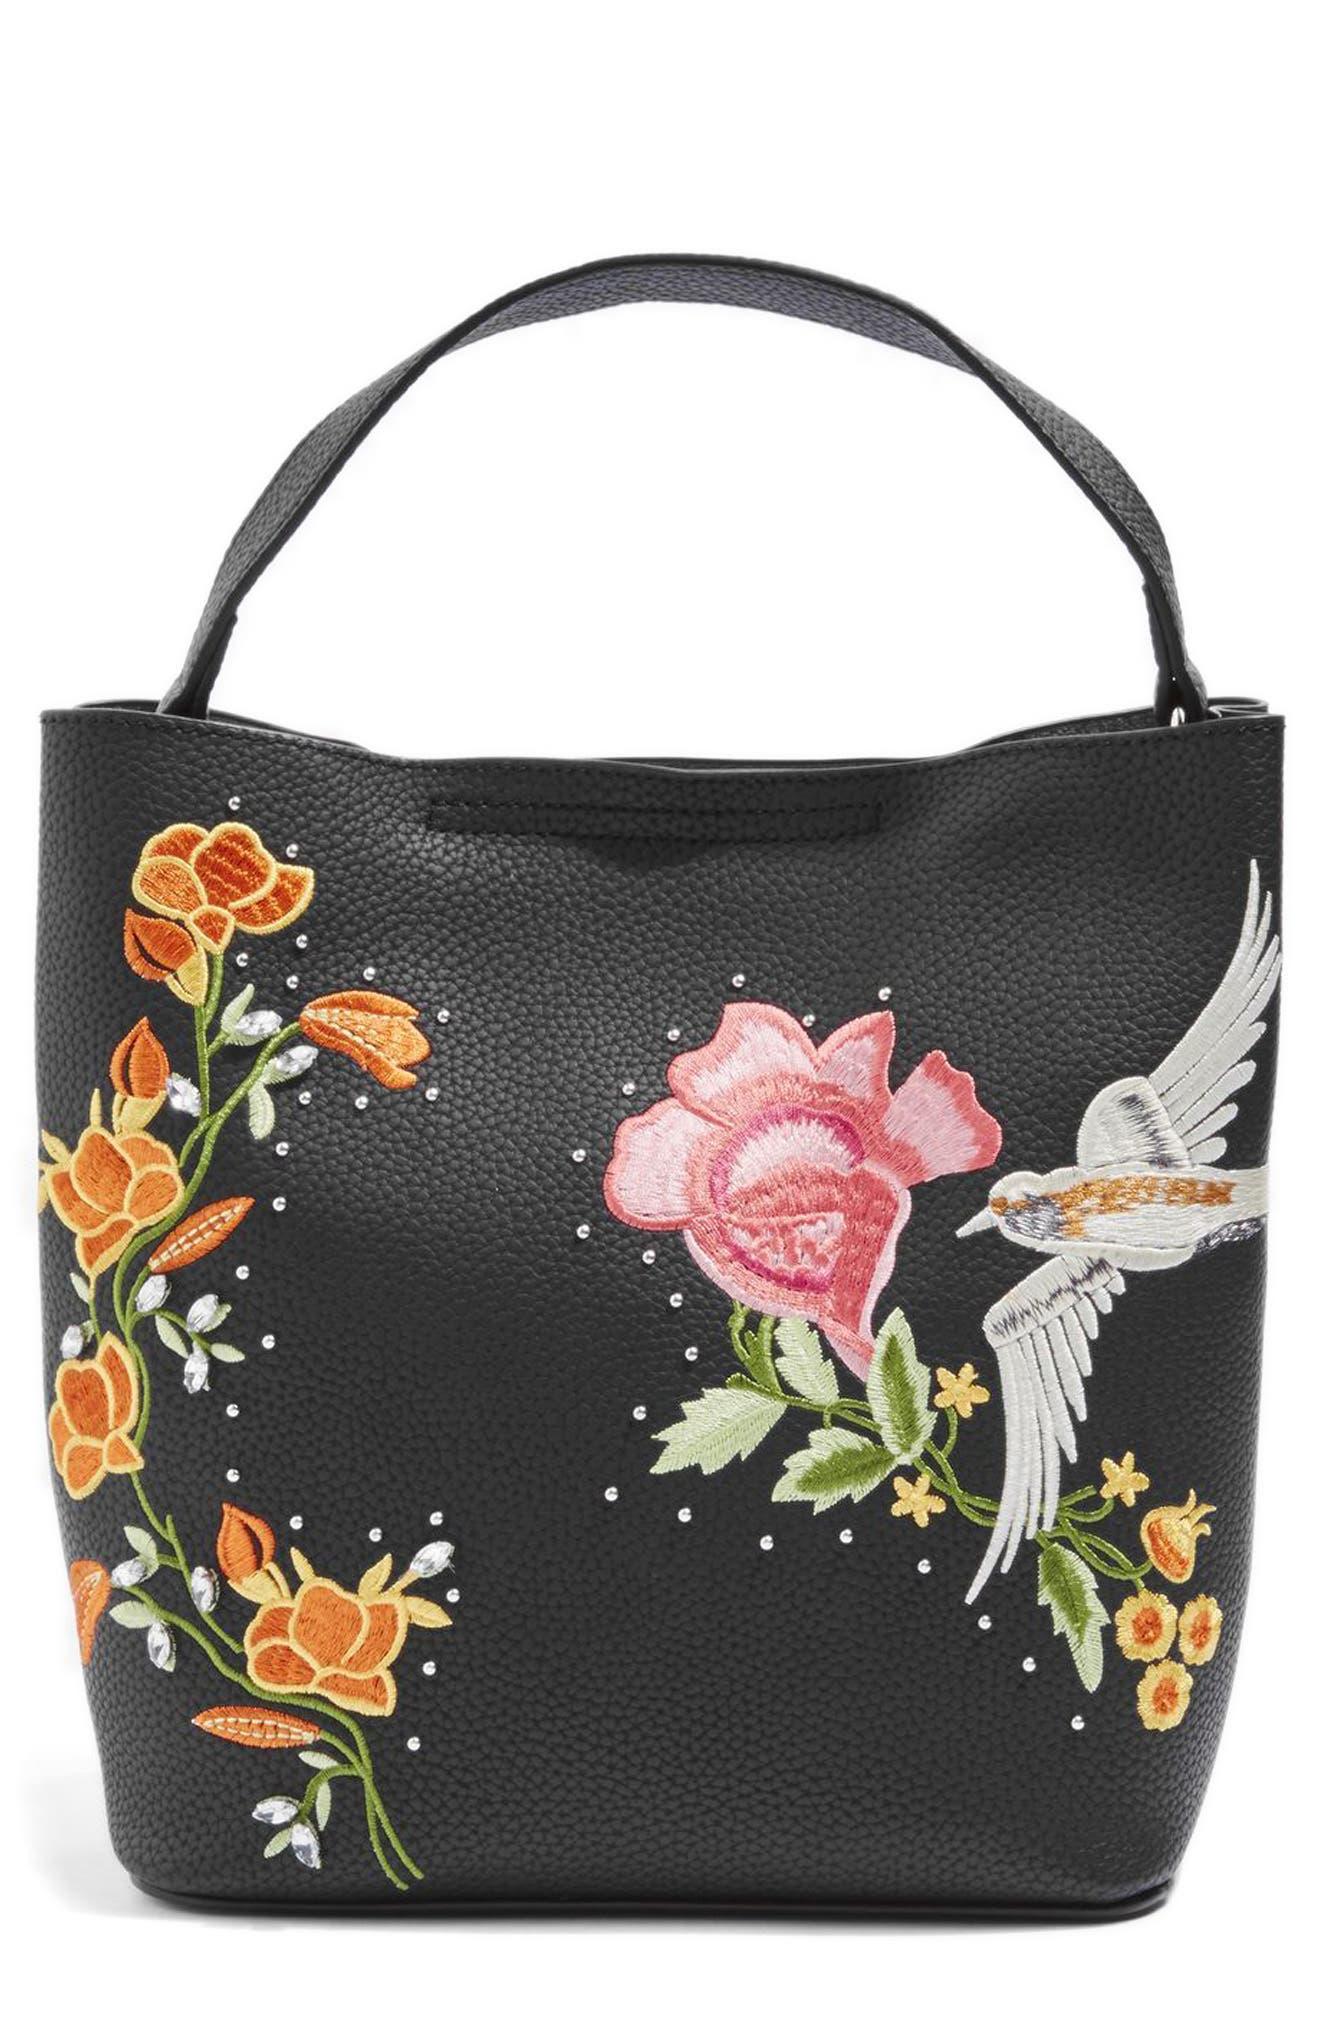 Topshop Embellished Faux Leather Tote Bag